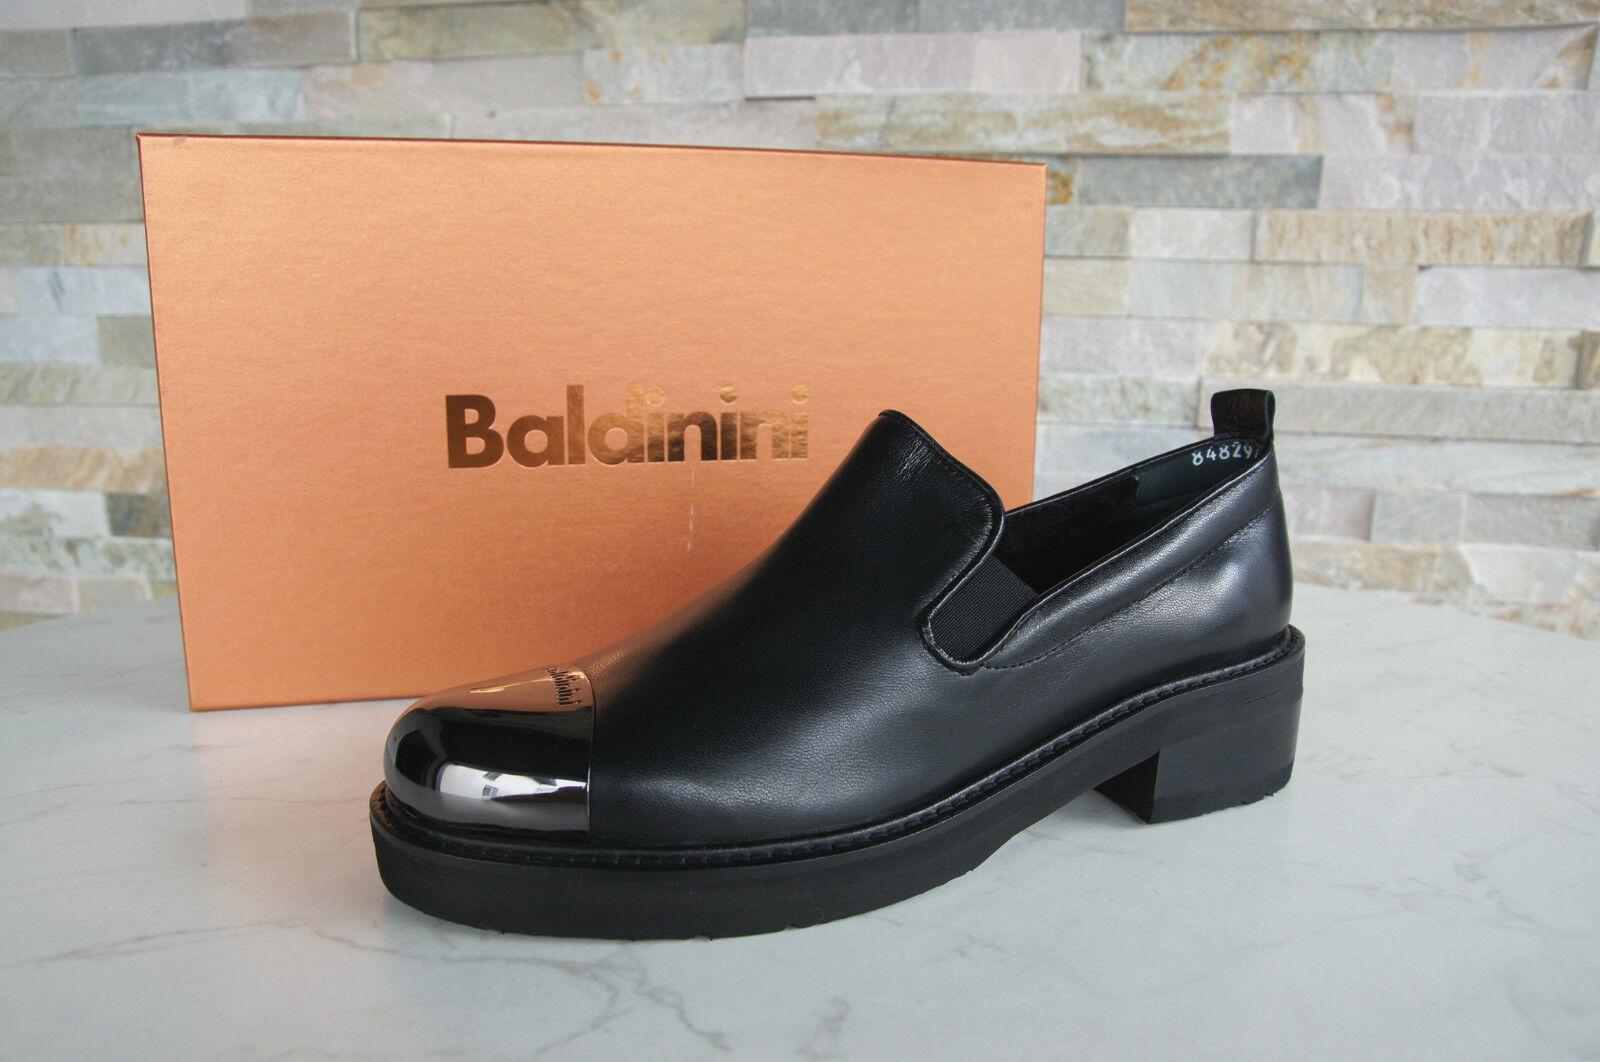 Originale Baldinini Gr 36 Pantofola Pelo Scarpe Basse 848297 Scarpe Nere Nuovo